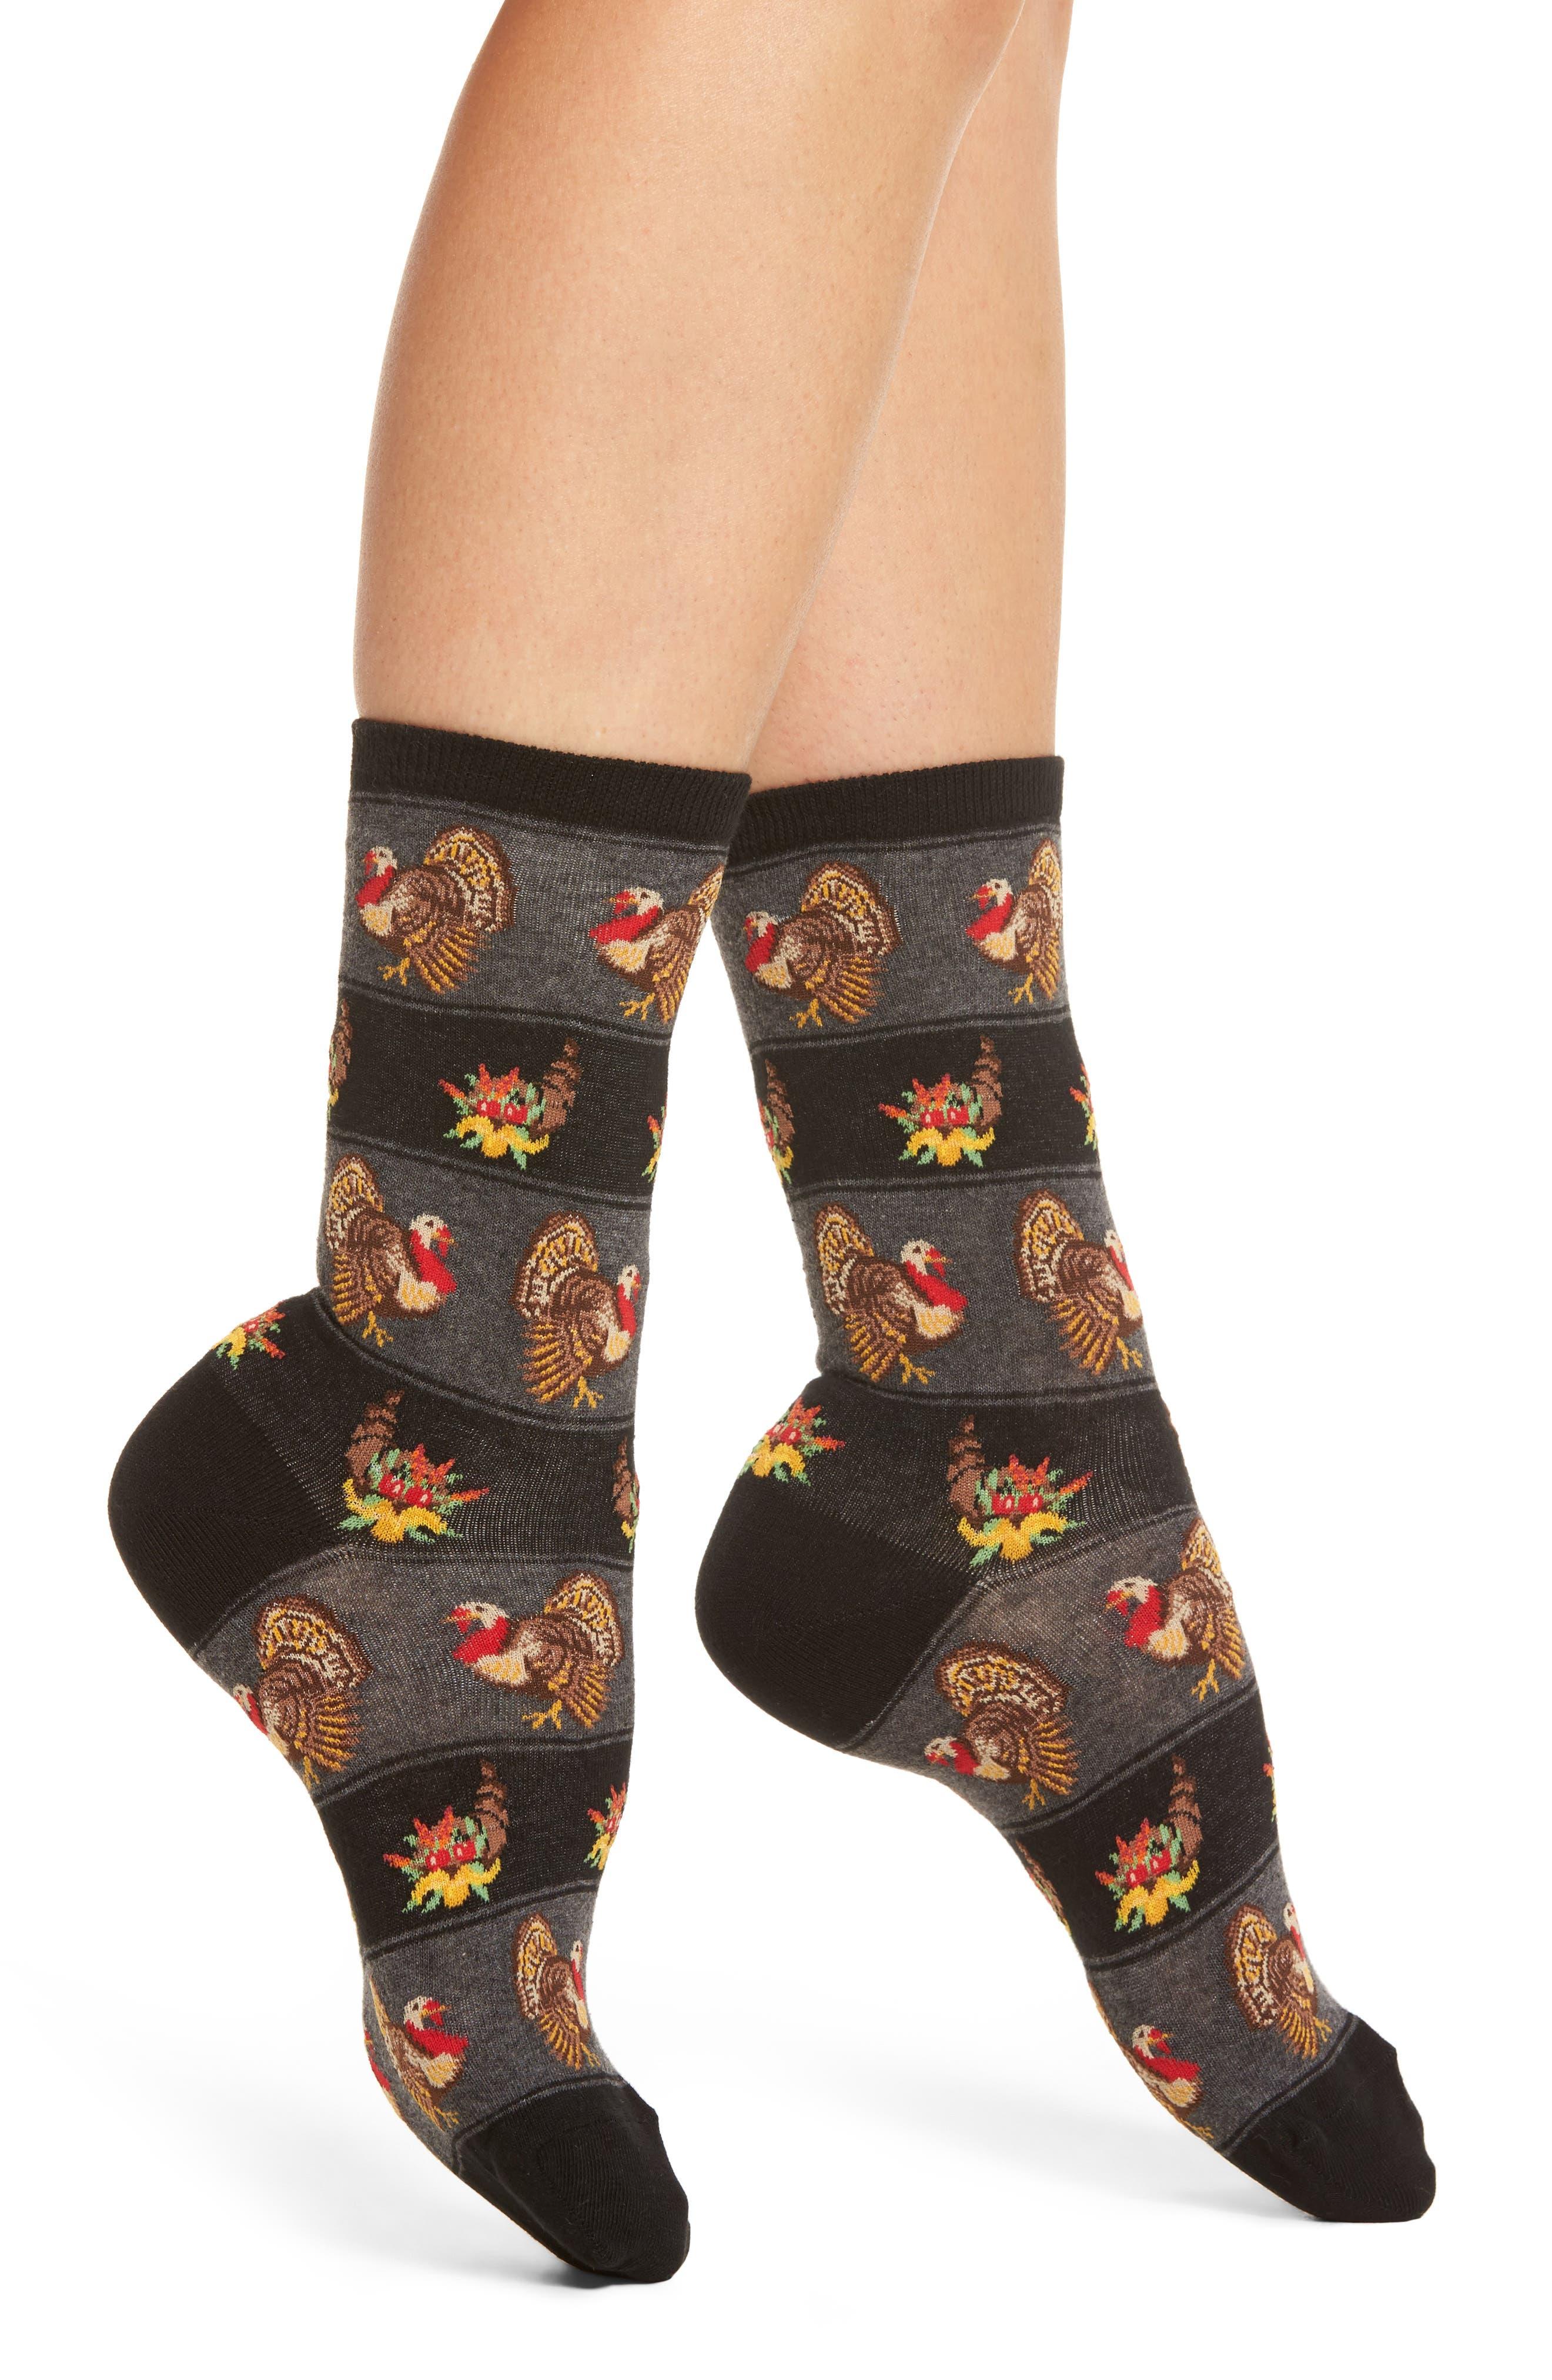 Hot Sox Thanksgiving Crew Socks (3 for $15)